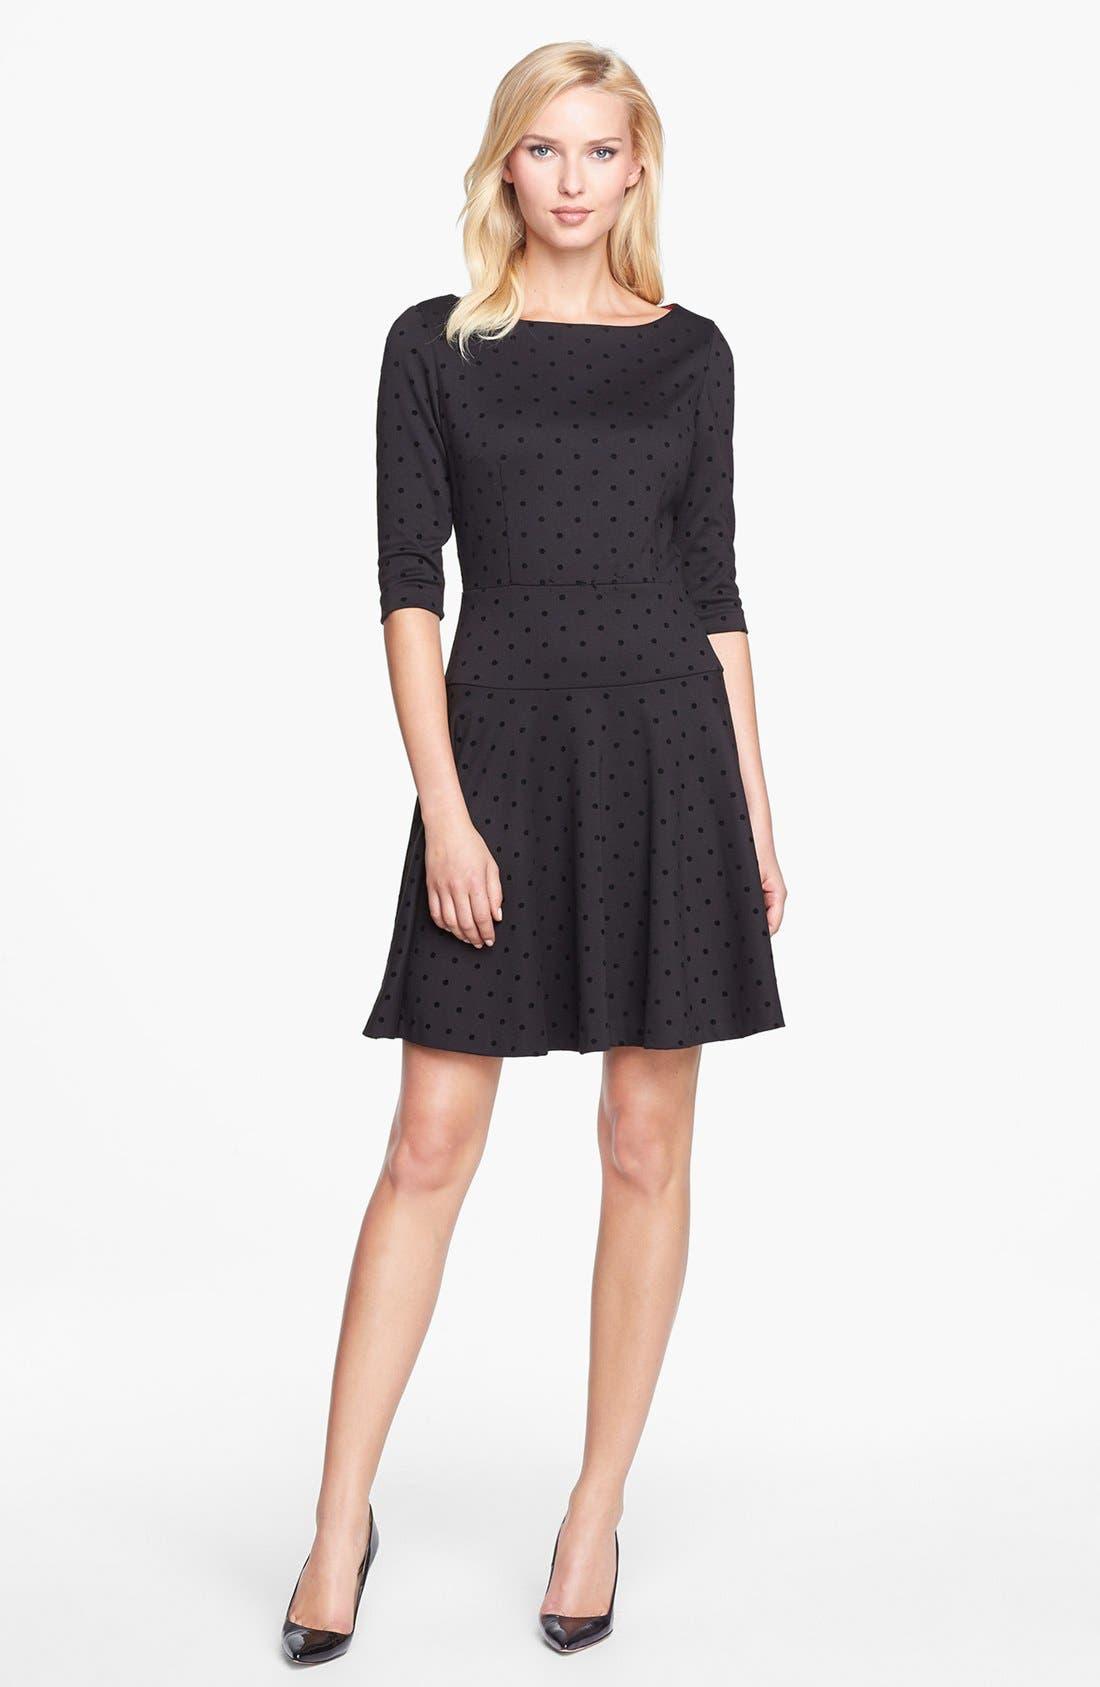 Alternate Image 1 Selected - Tahari Flocked Dot Ponte Knit Fit & Flare Dress